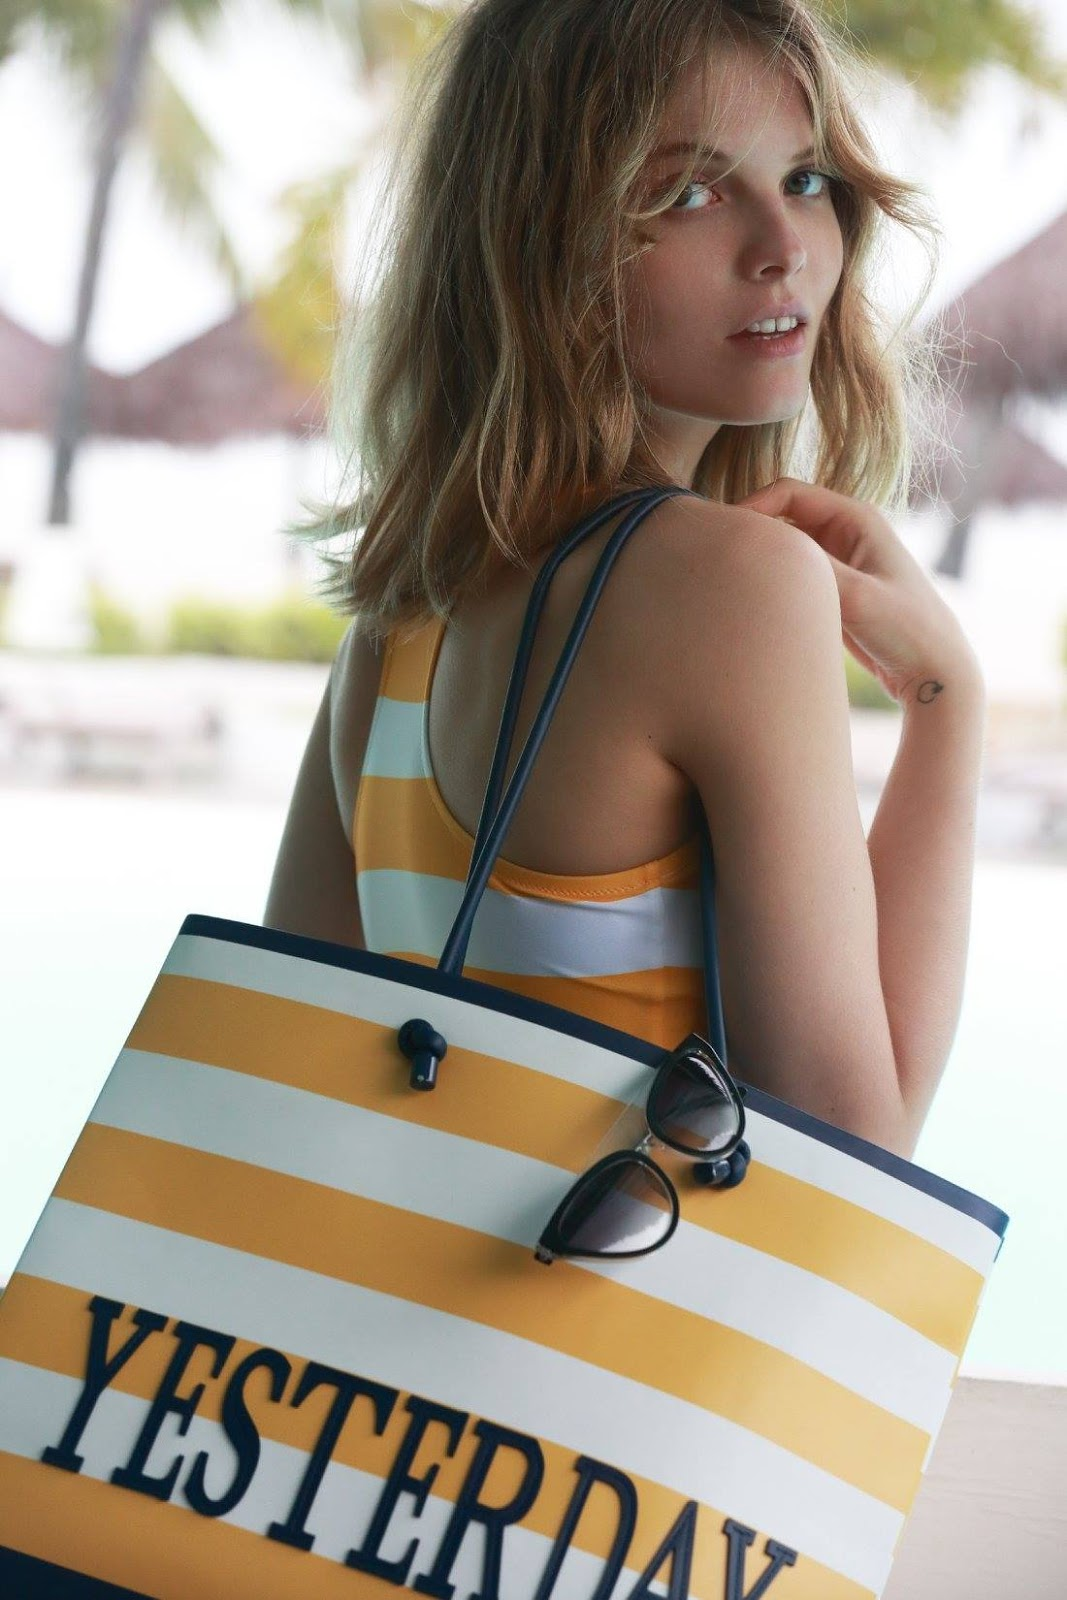 Alberta Ferretti Spring Summer 2018 'Denim & Stripes' Collection